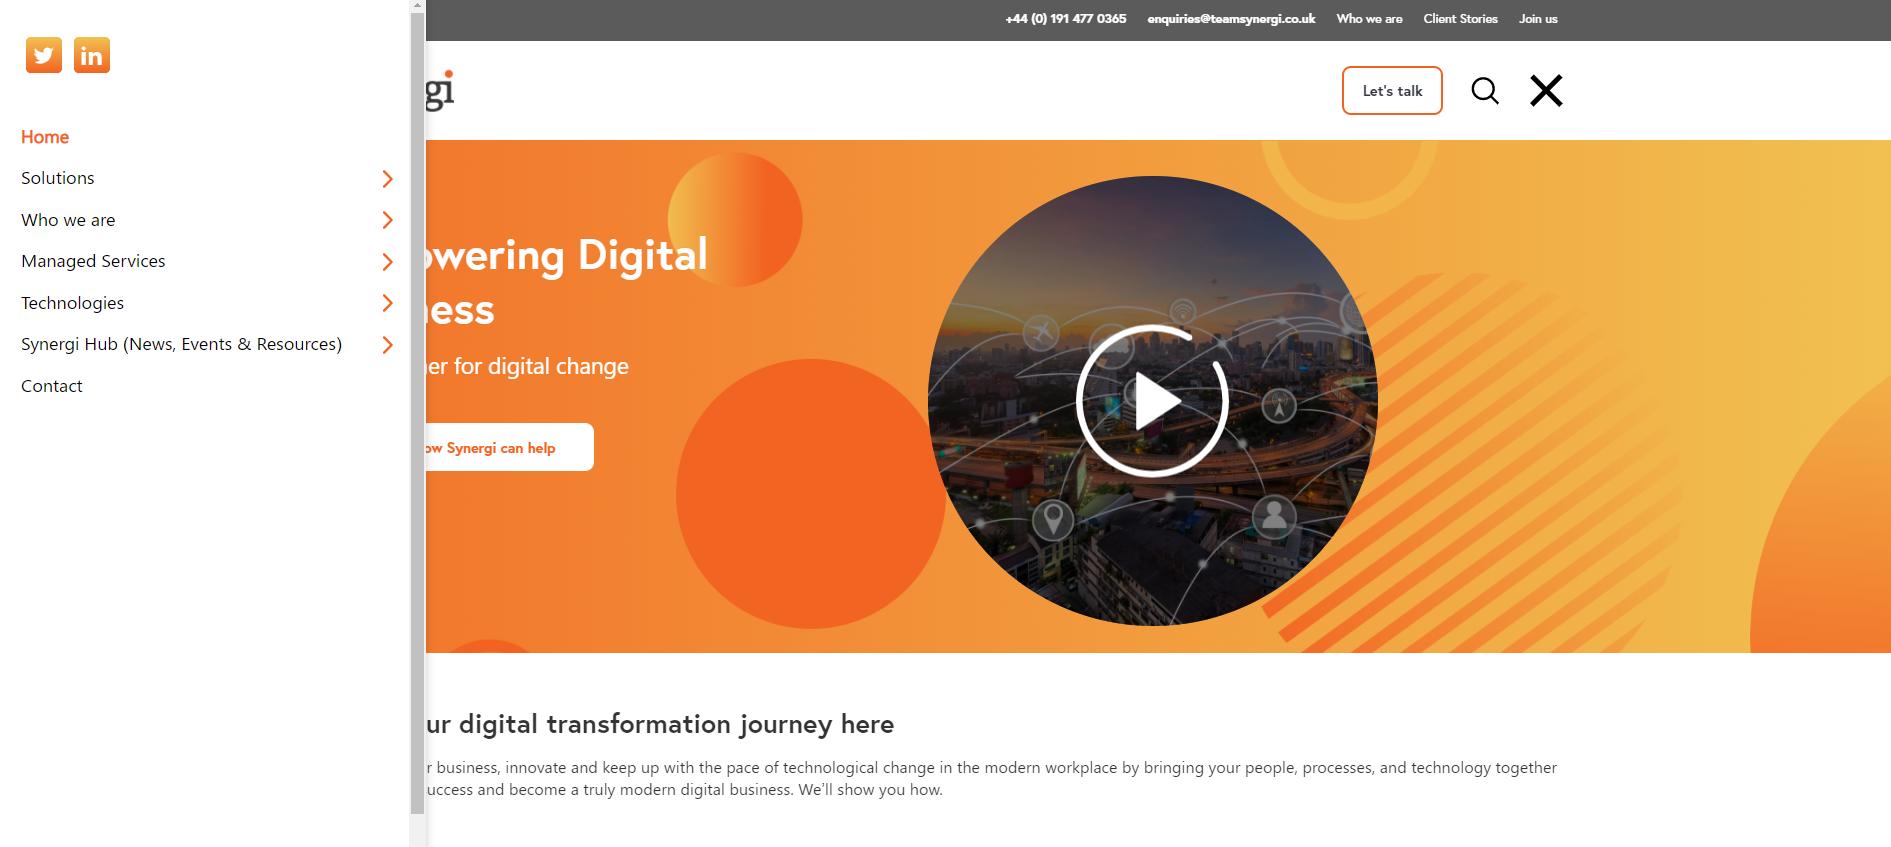 Screenshot 2021-03-18 112437-Synergi launches on-demand webinar access